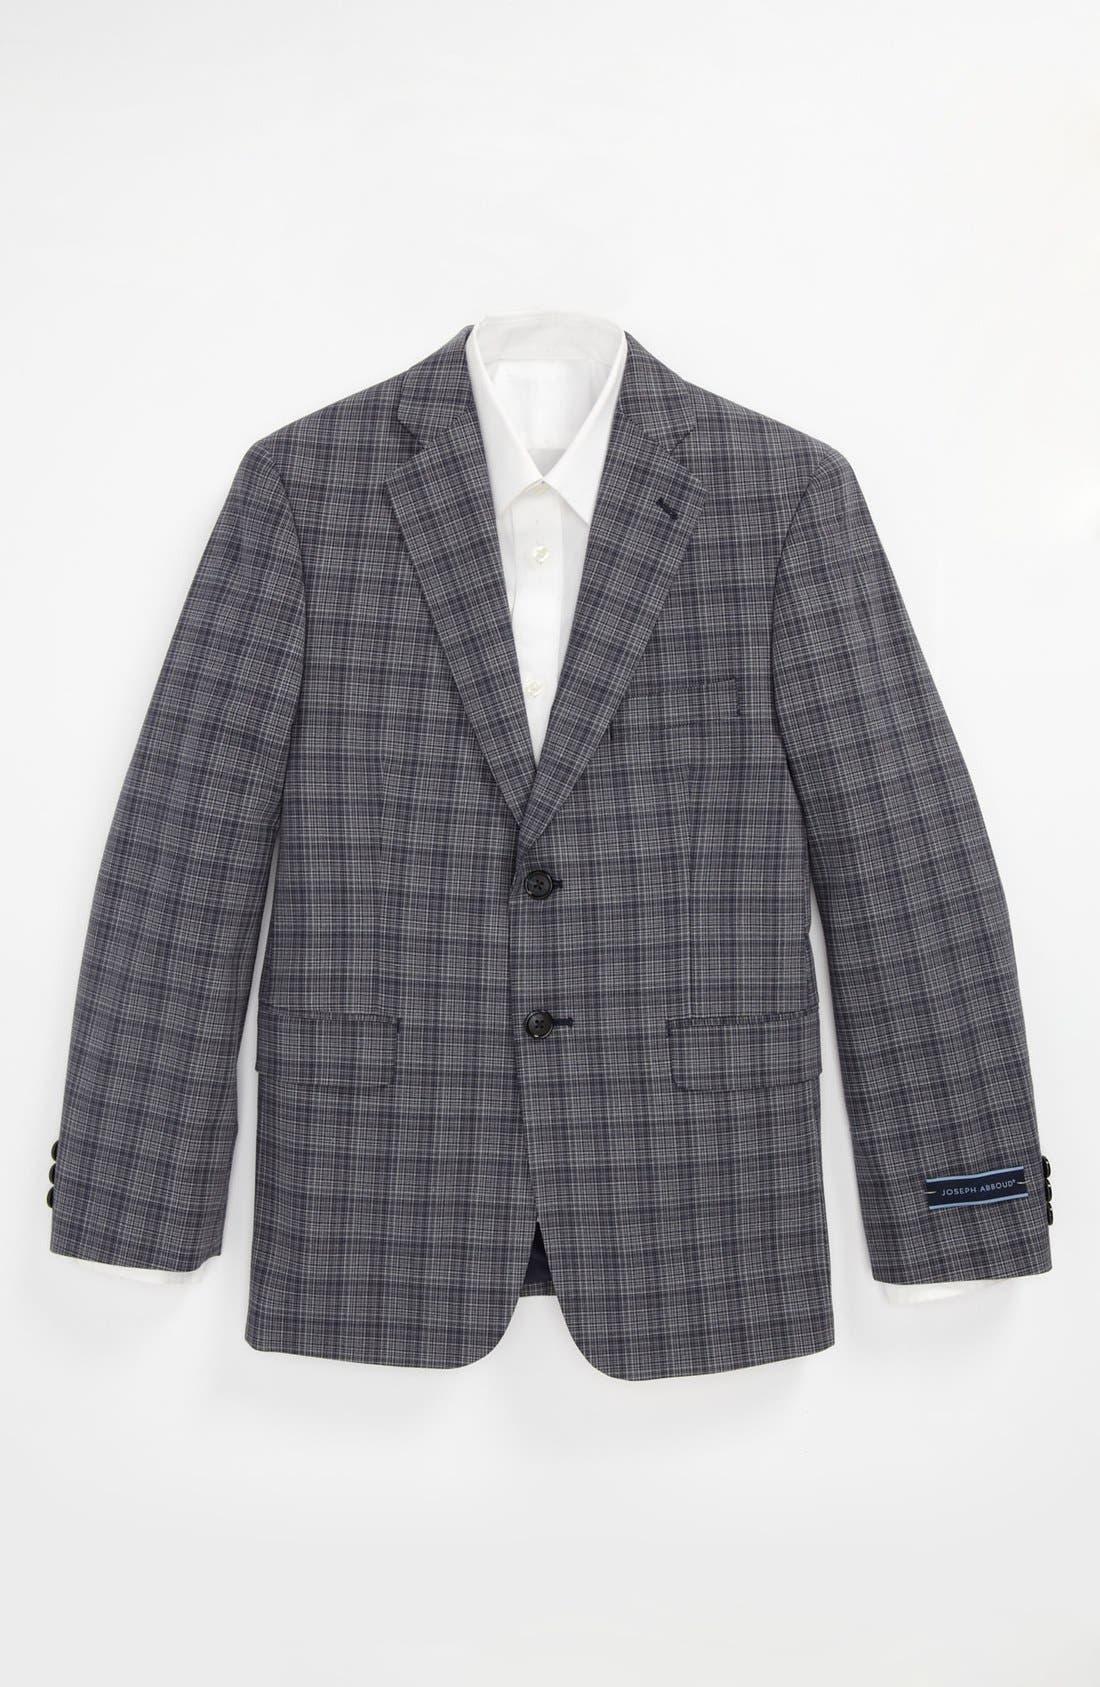 Alternate Image 1 Selected - Joseph Abboud Plaid Sportcoat (Big Boys)